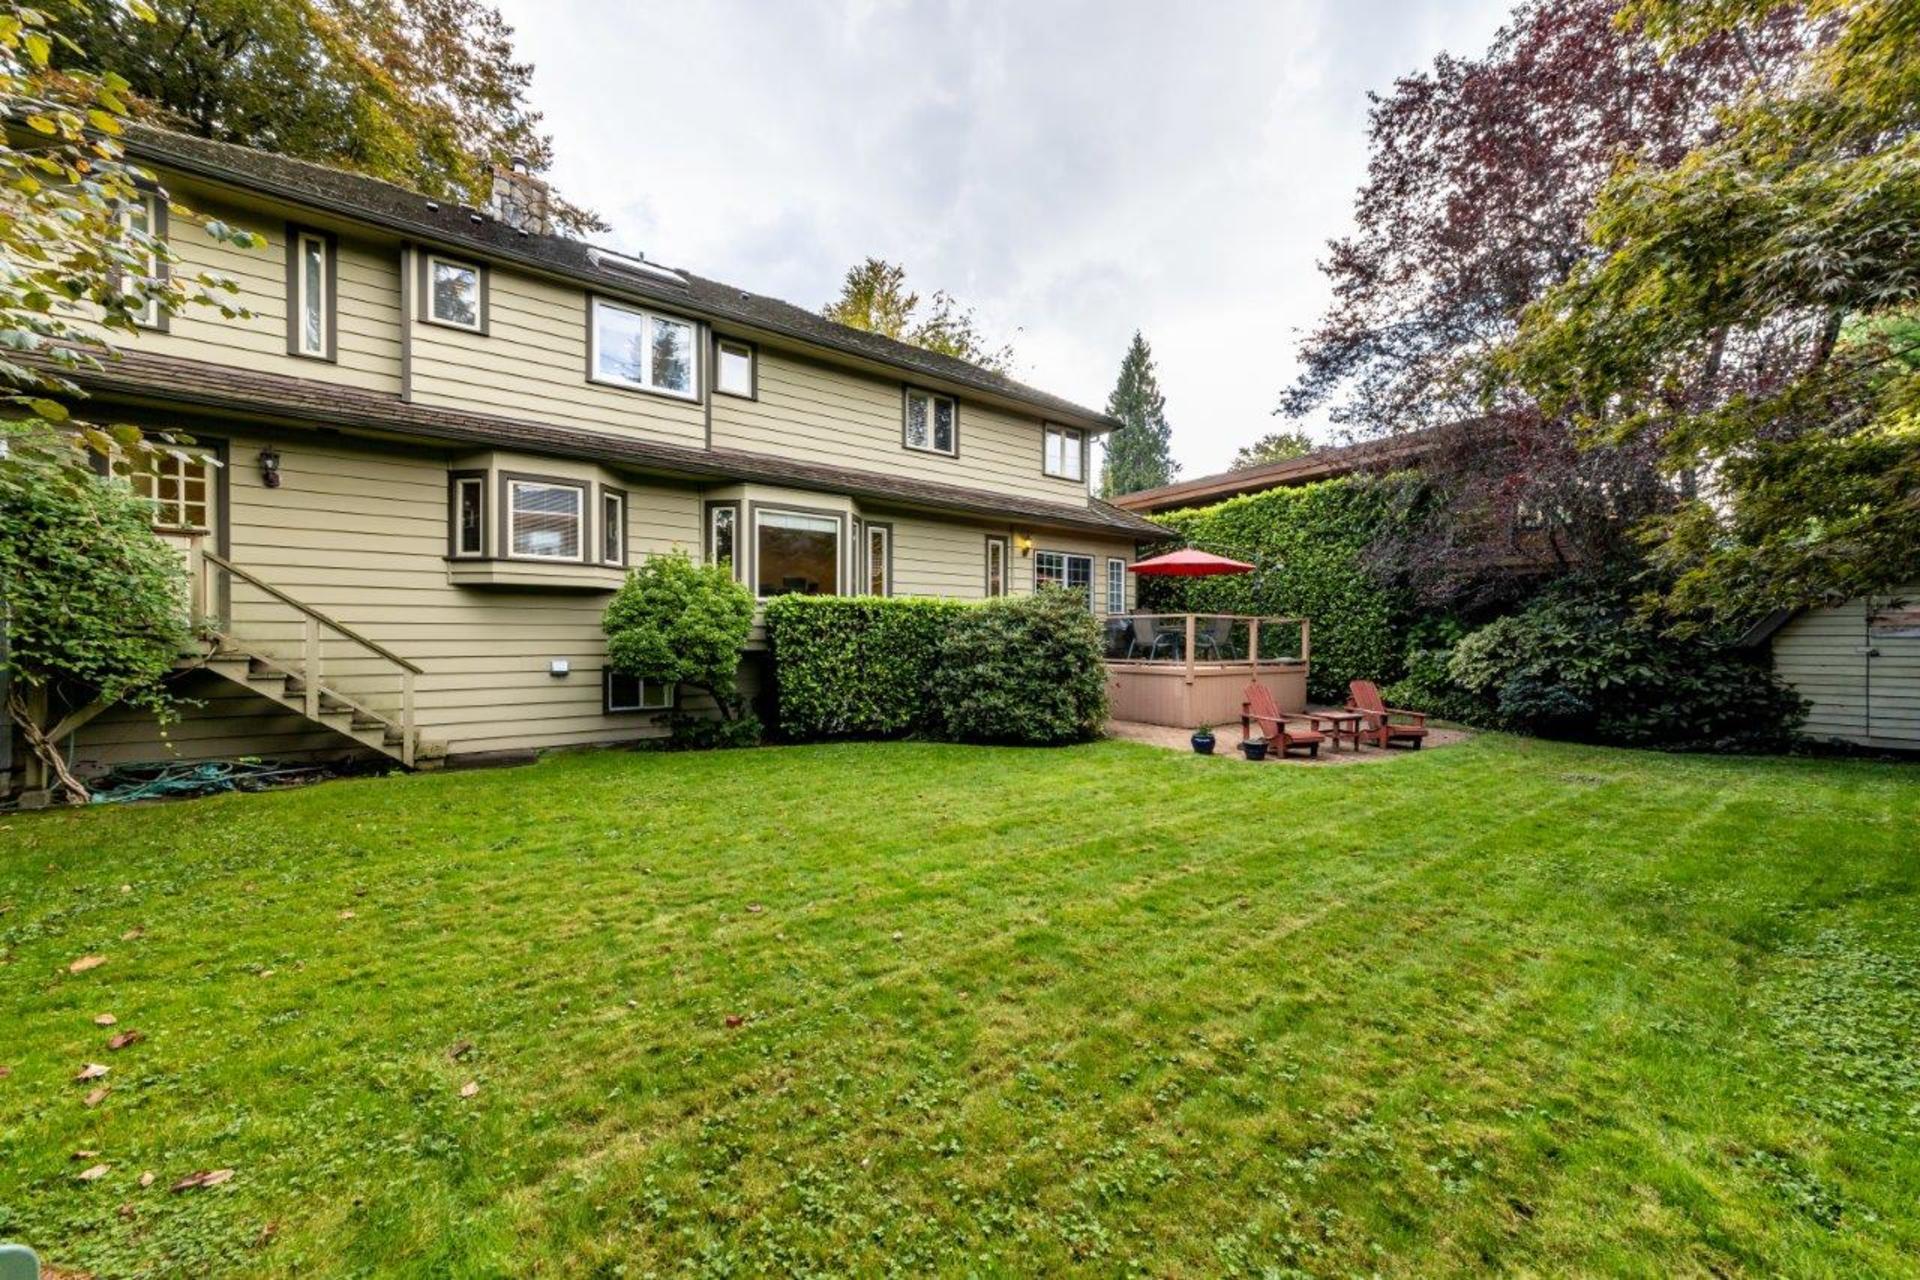 910belmont-7 at 910 Belmont Avenue, Edgemont, North Vancouver